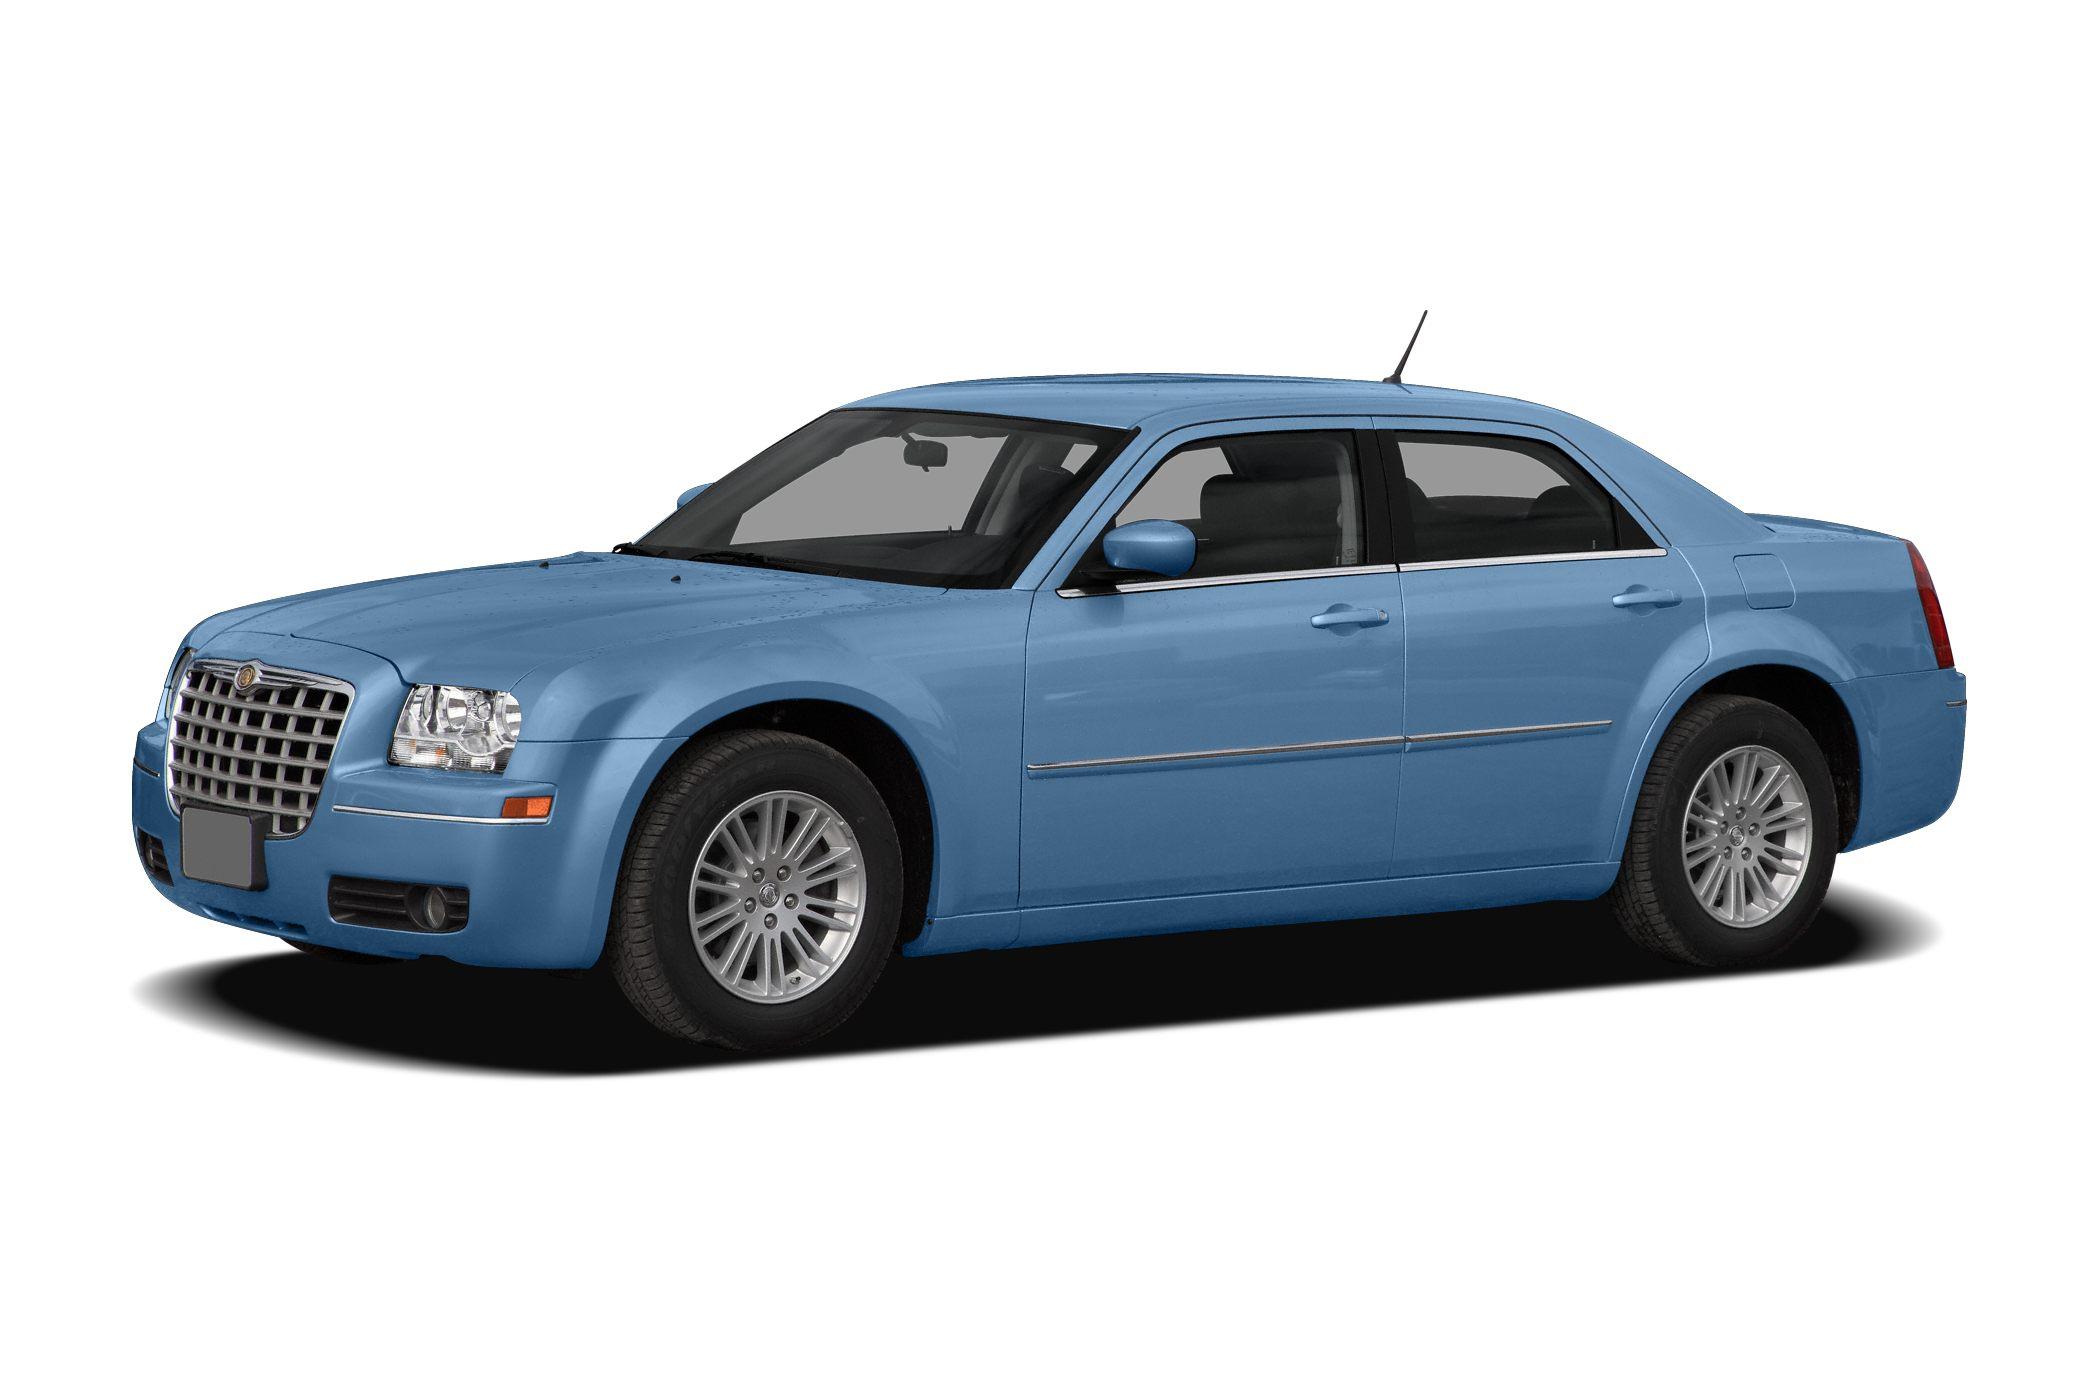 2008 Chrysler 300 Touring Sedan for sale in Fresno for $14,995 with 92,537 miles.